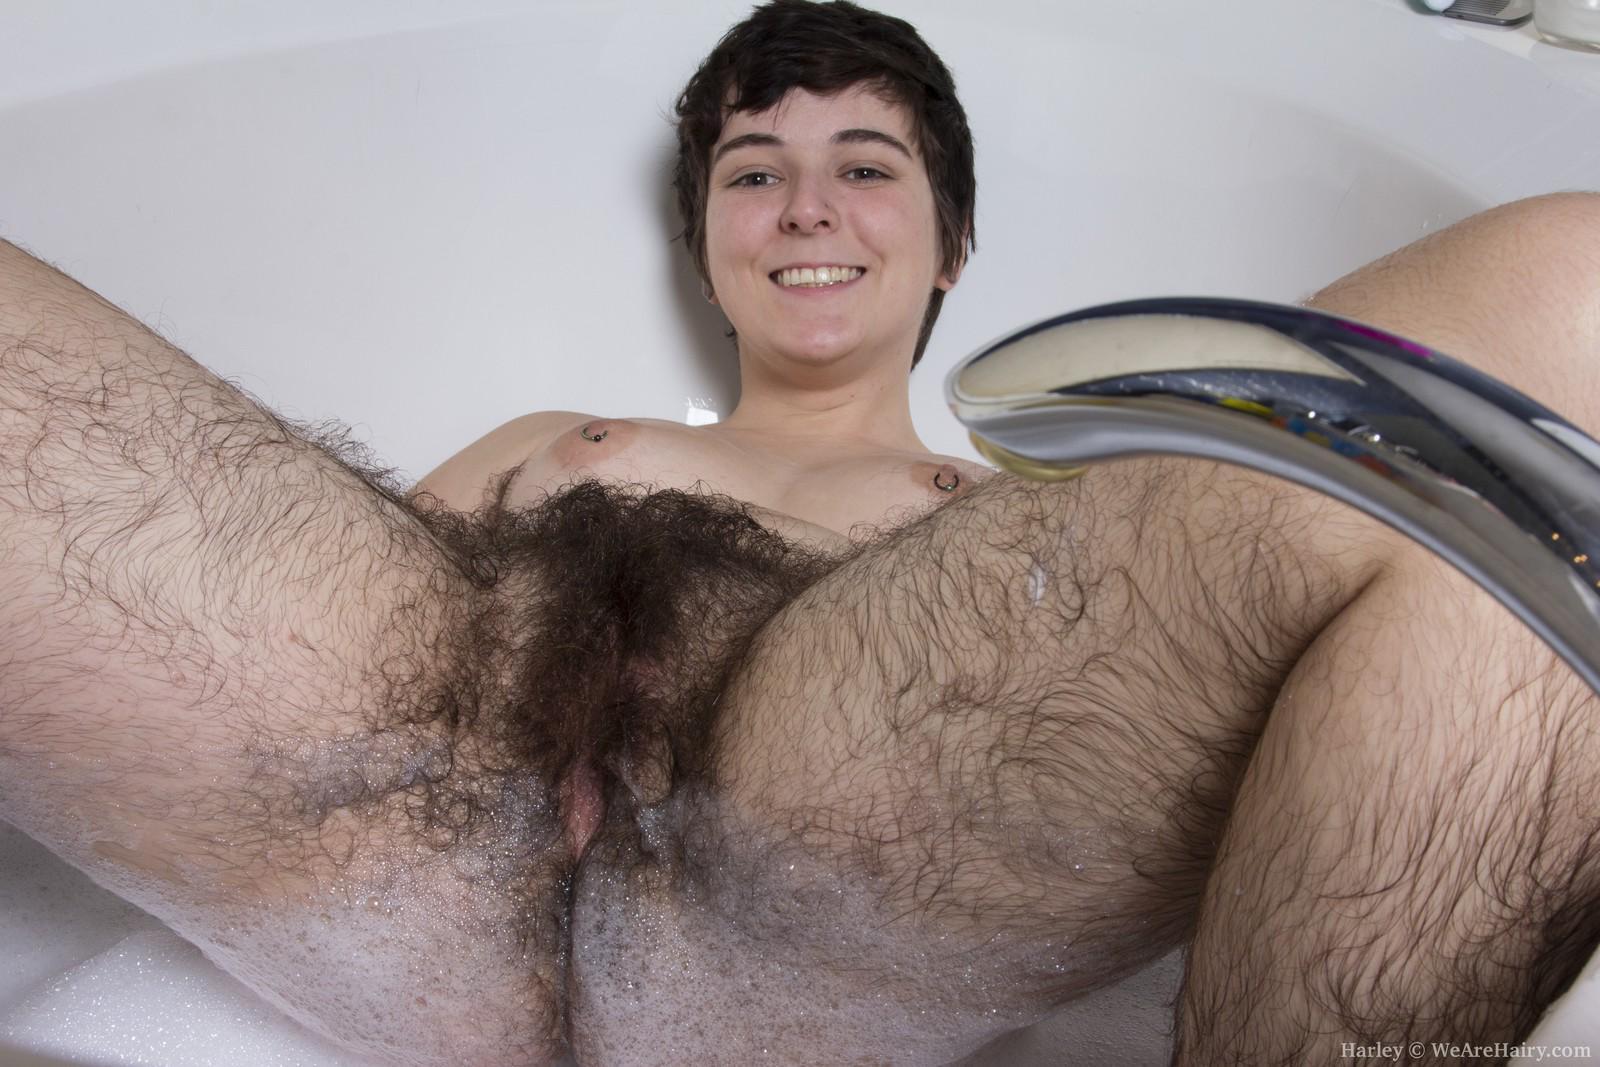 hairiest-nude-ever